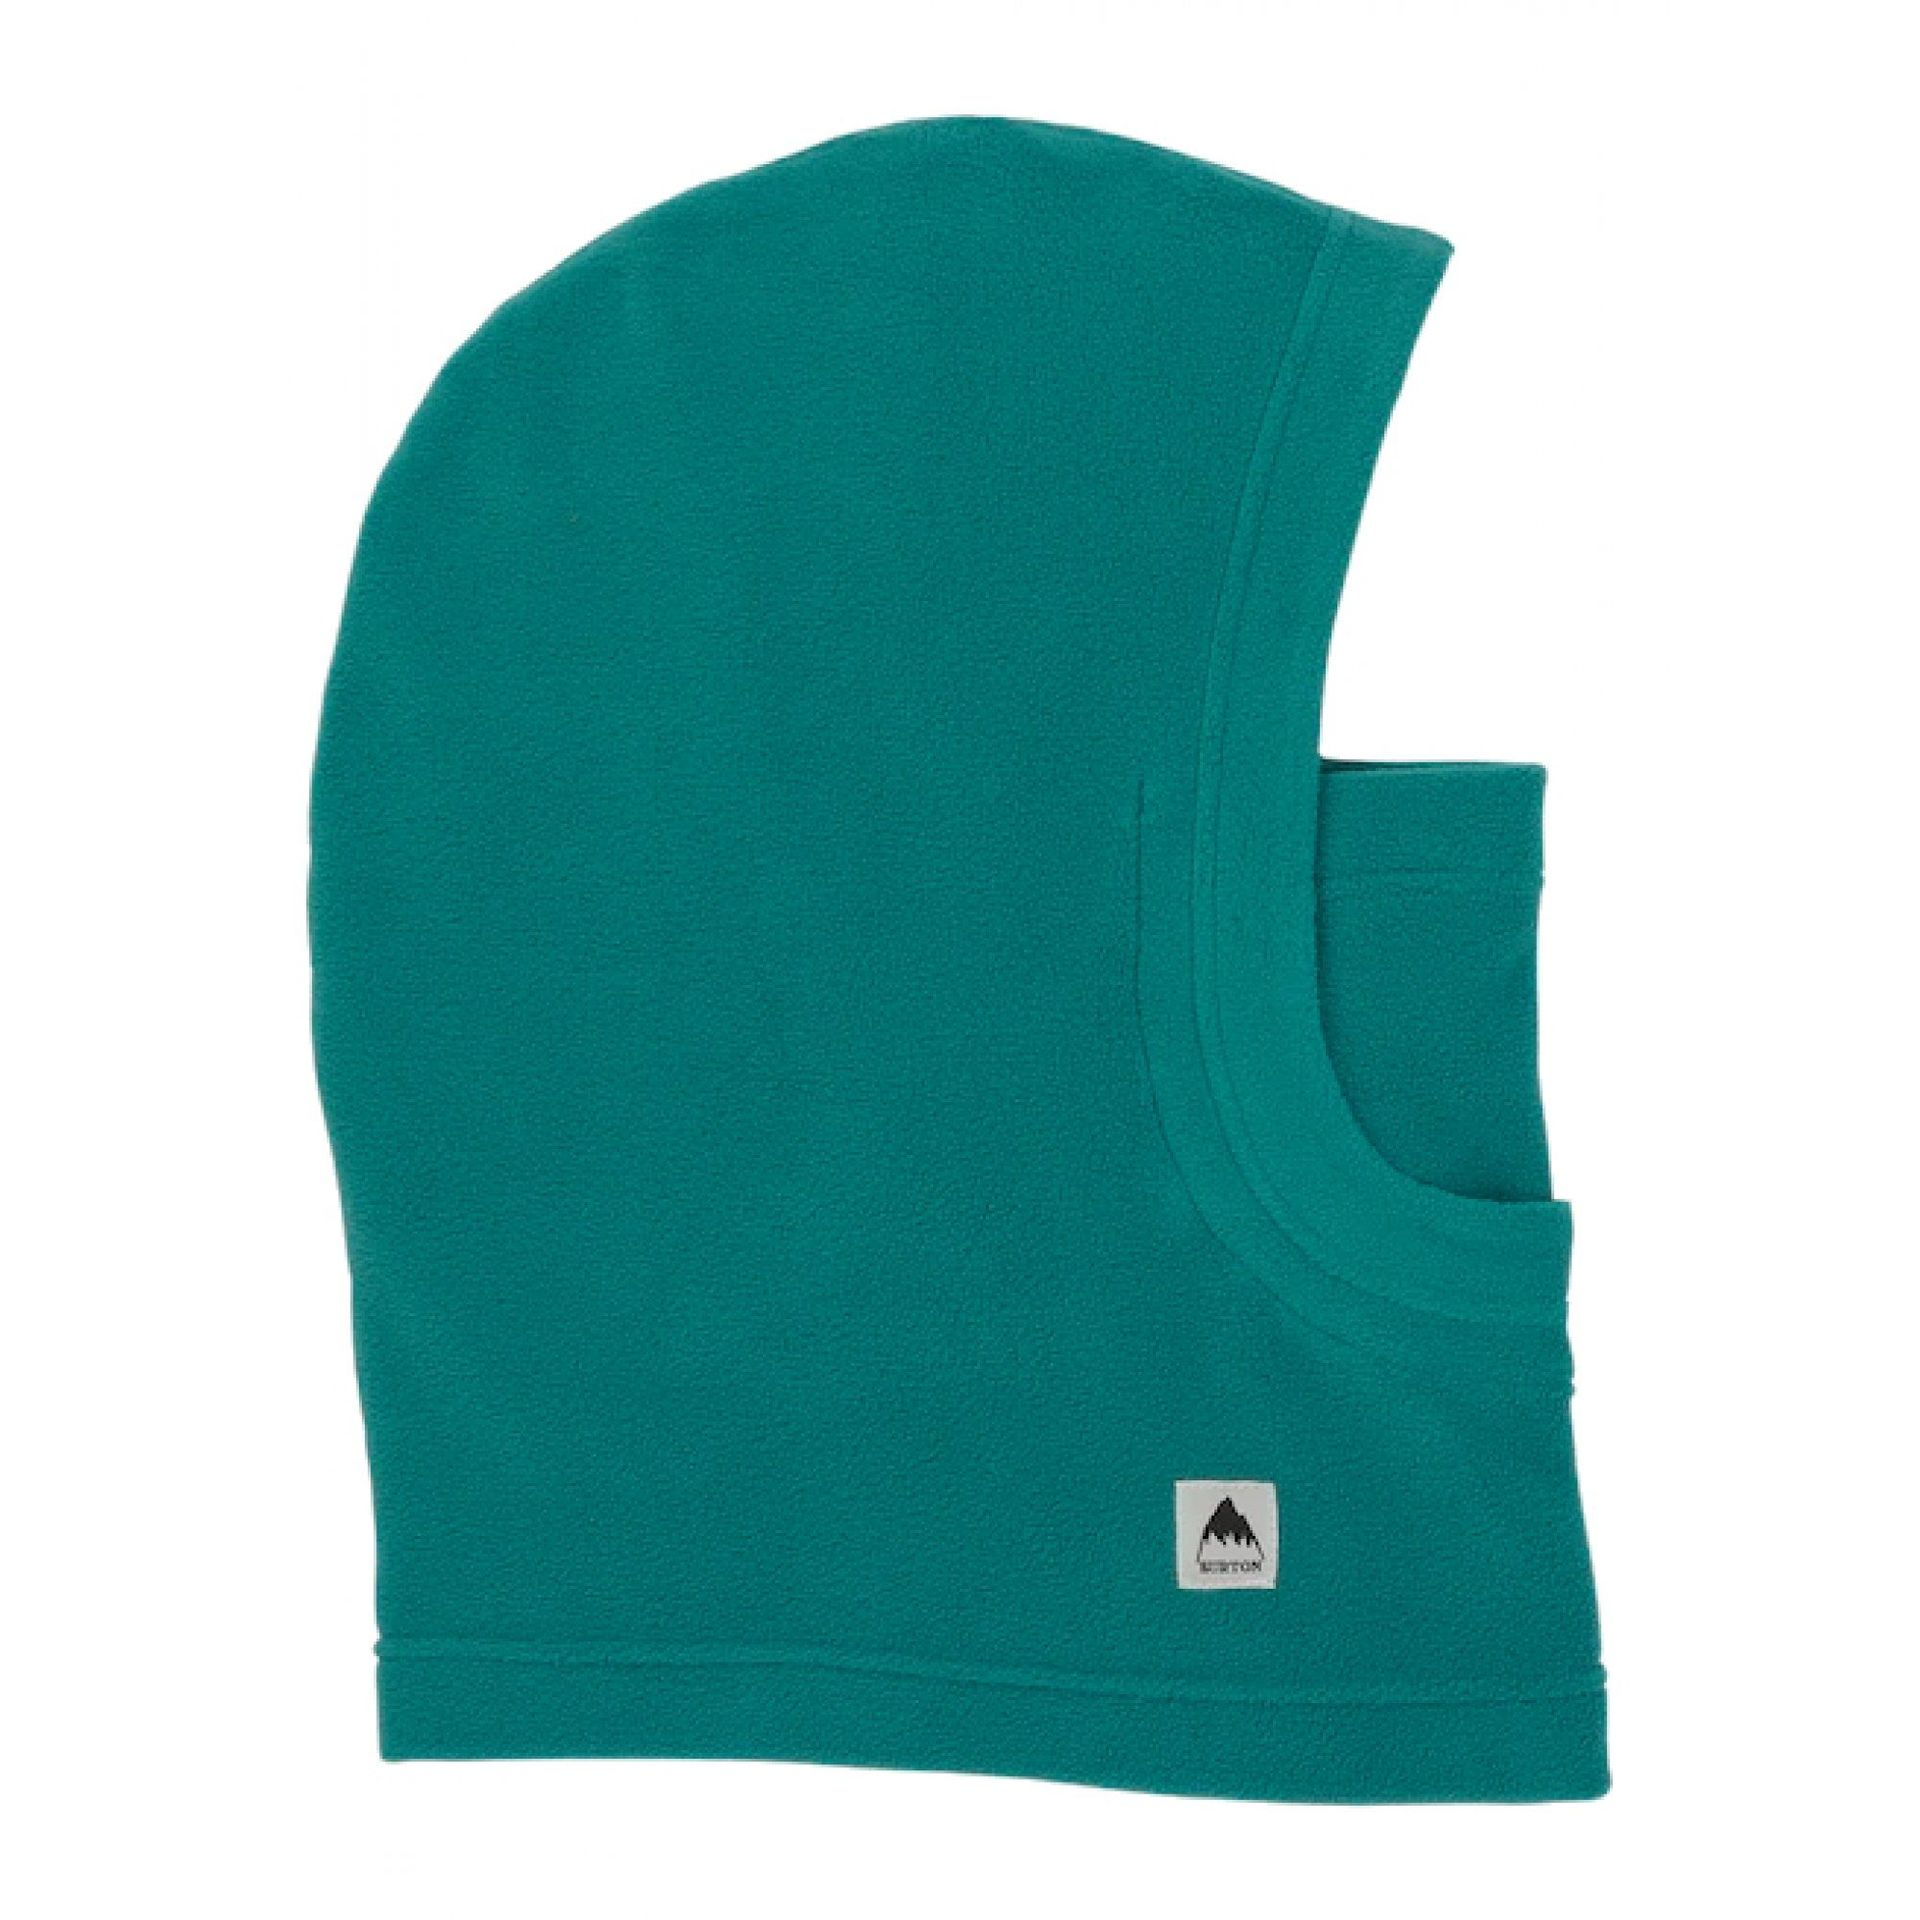 KOMINIARKA KAPTUR BURTON KIDS' BURKE GREEN BLUE SLATE 204891 400